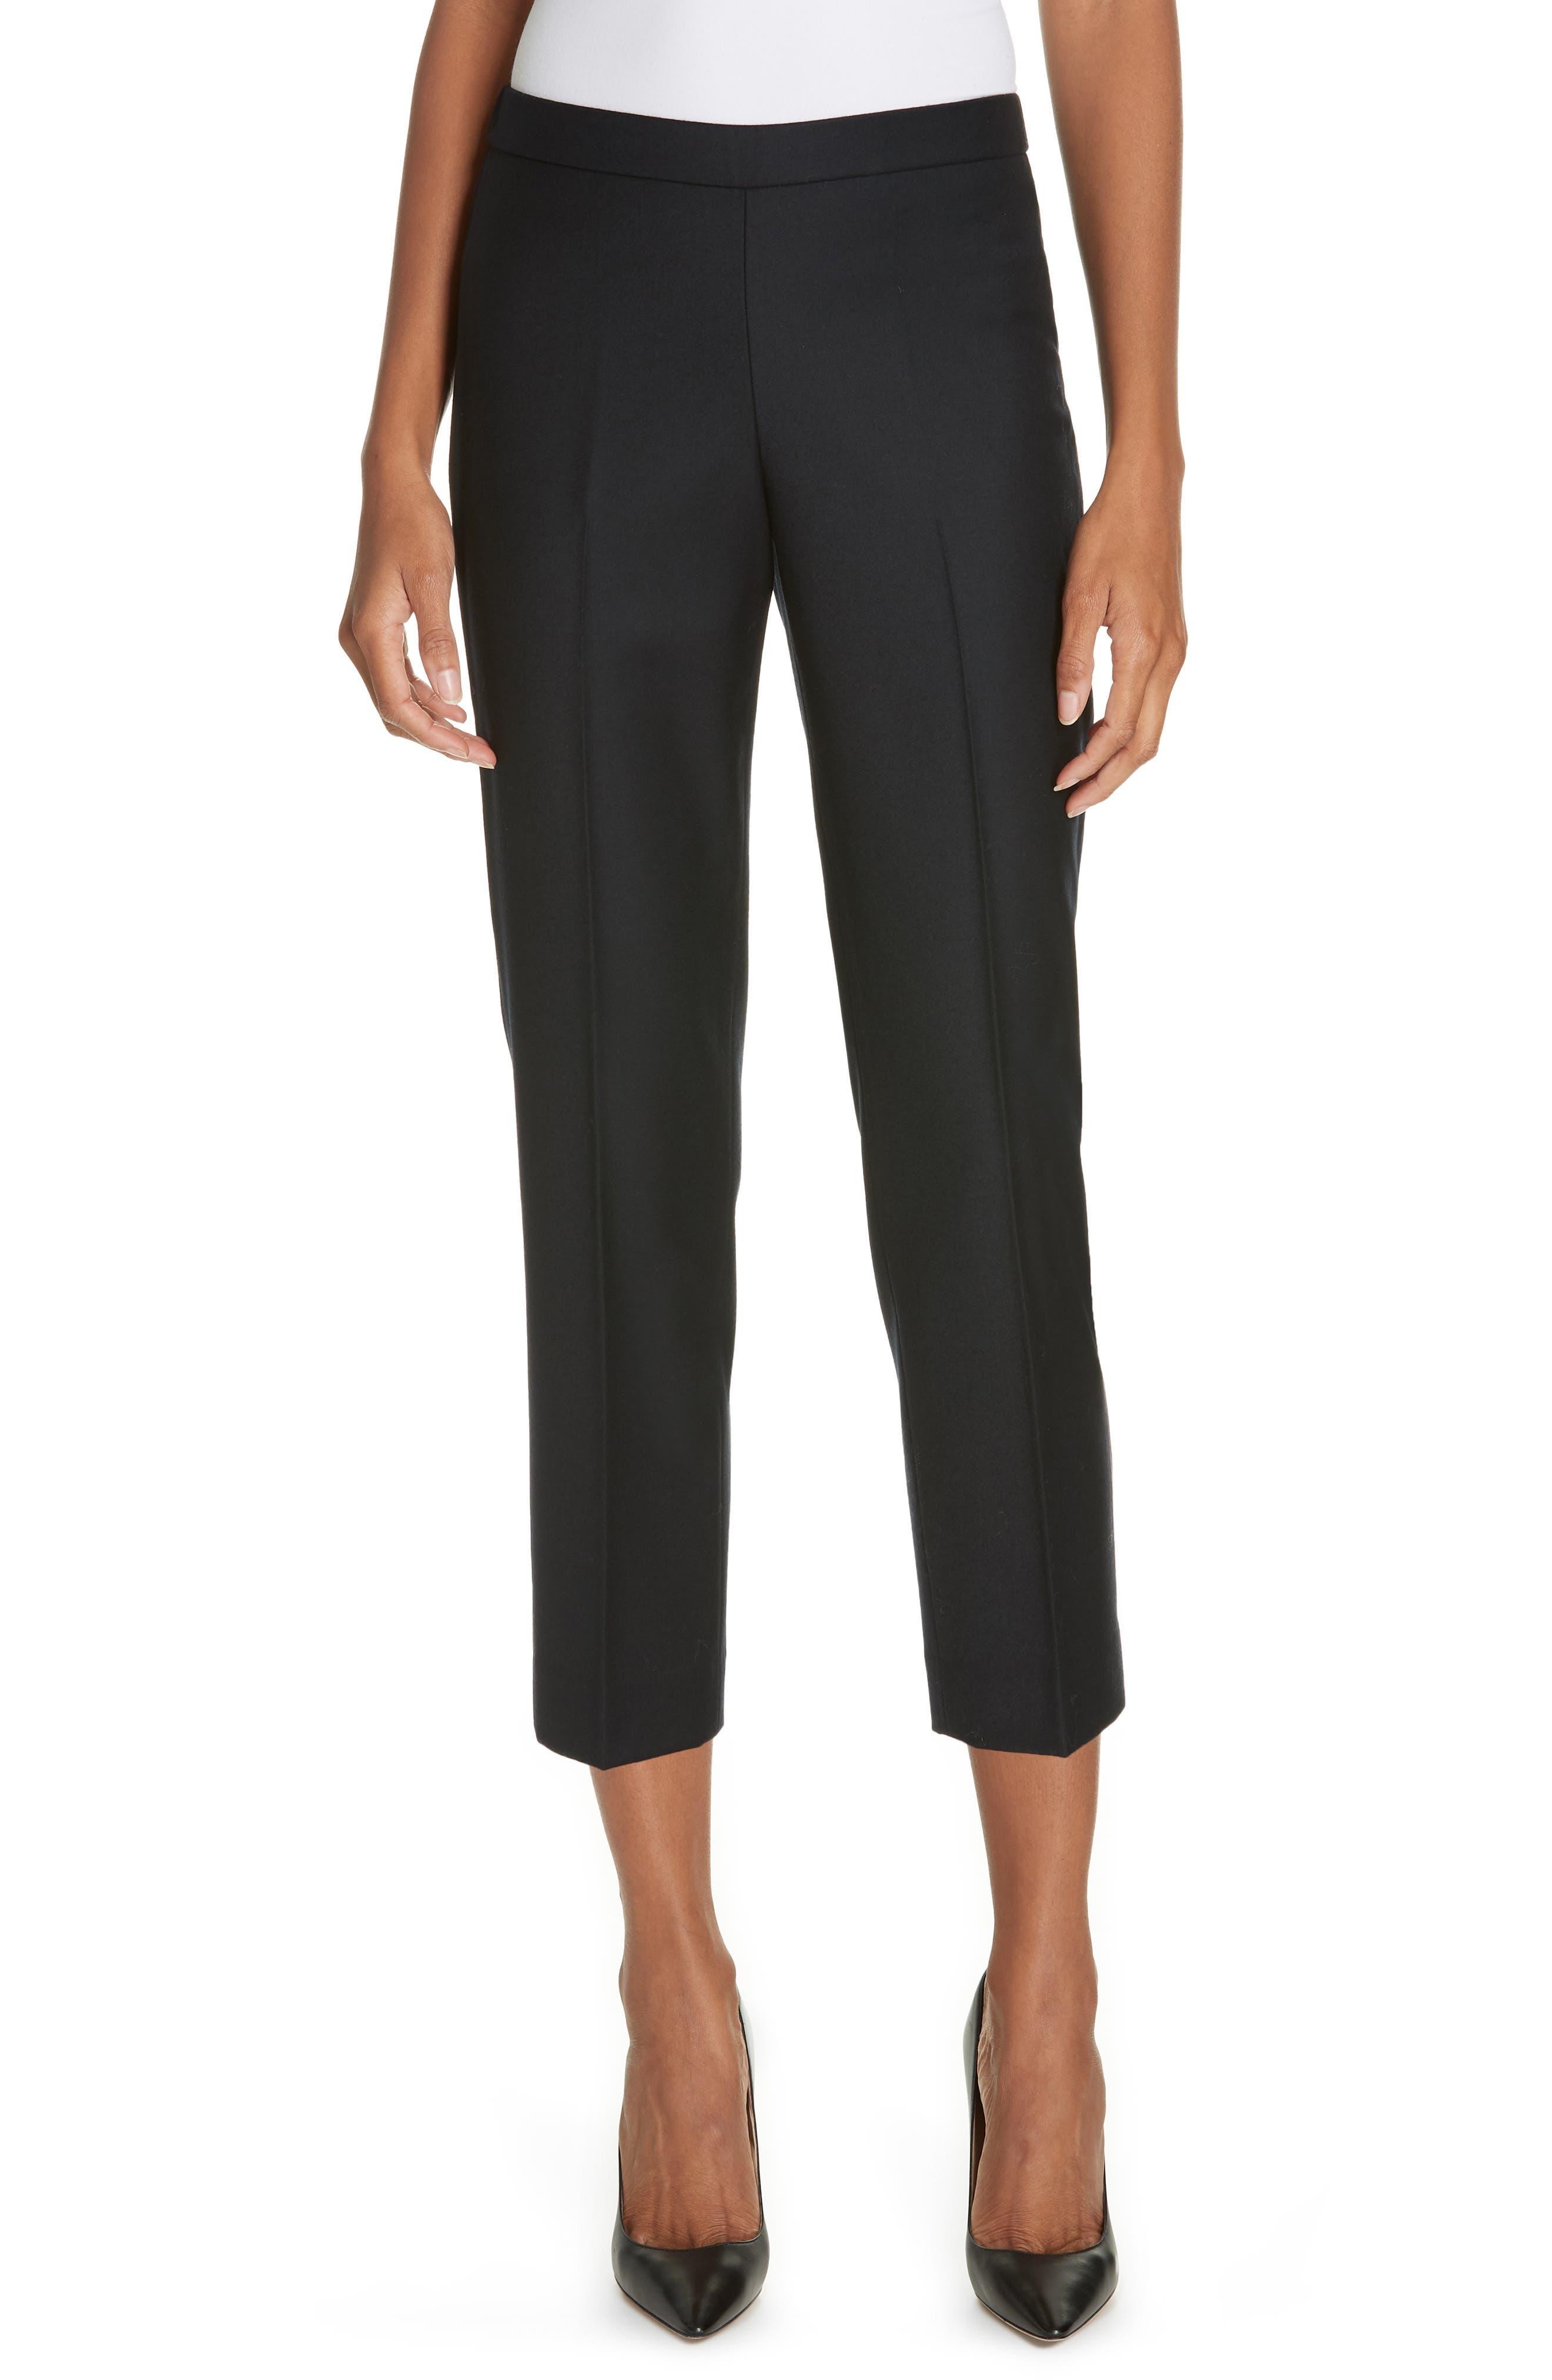 Basic Pull-On Sleek Flannel Pants in Black Ink